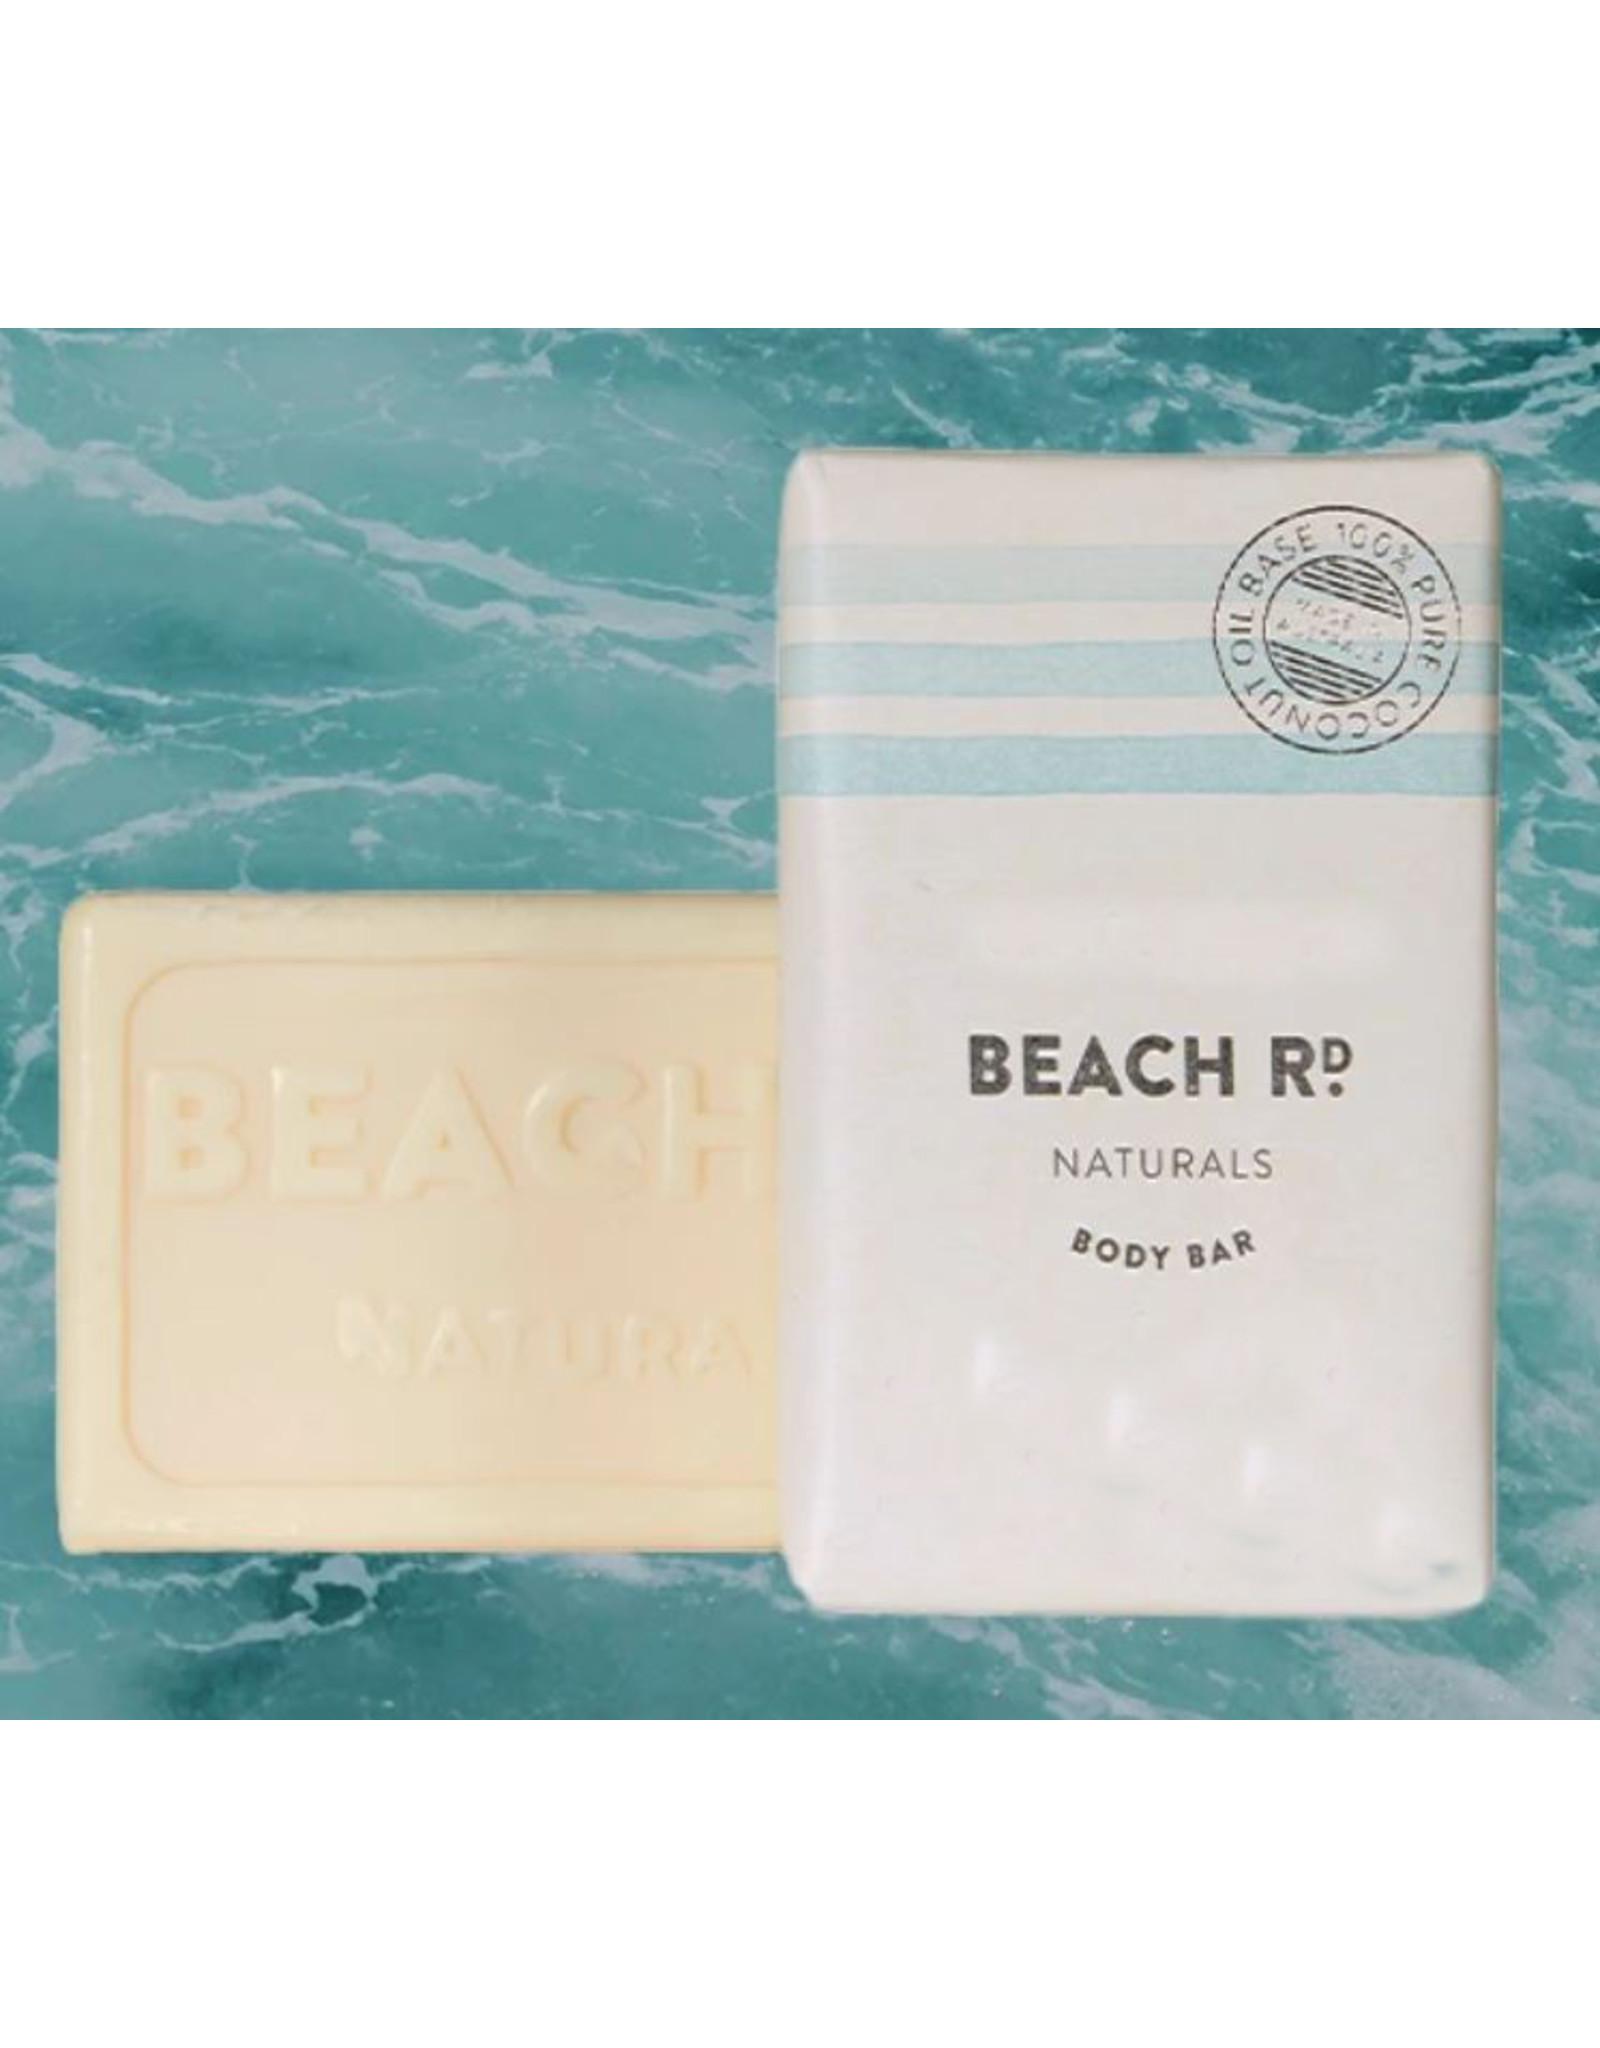 50g Beach Rd Naturals Coconut & Lime Body Bar